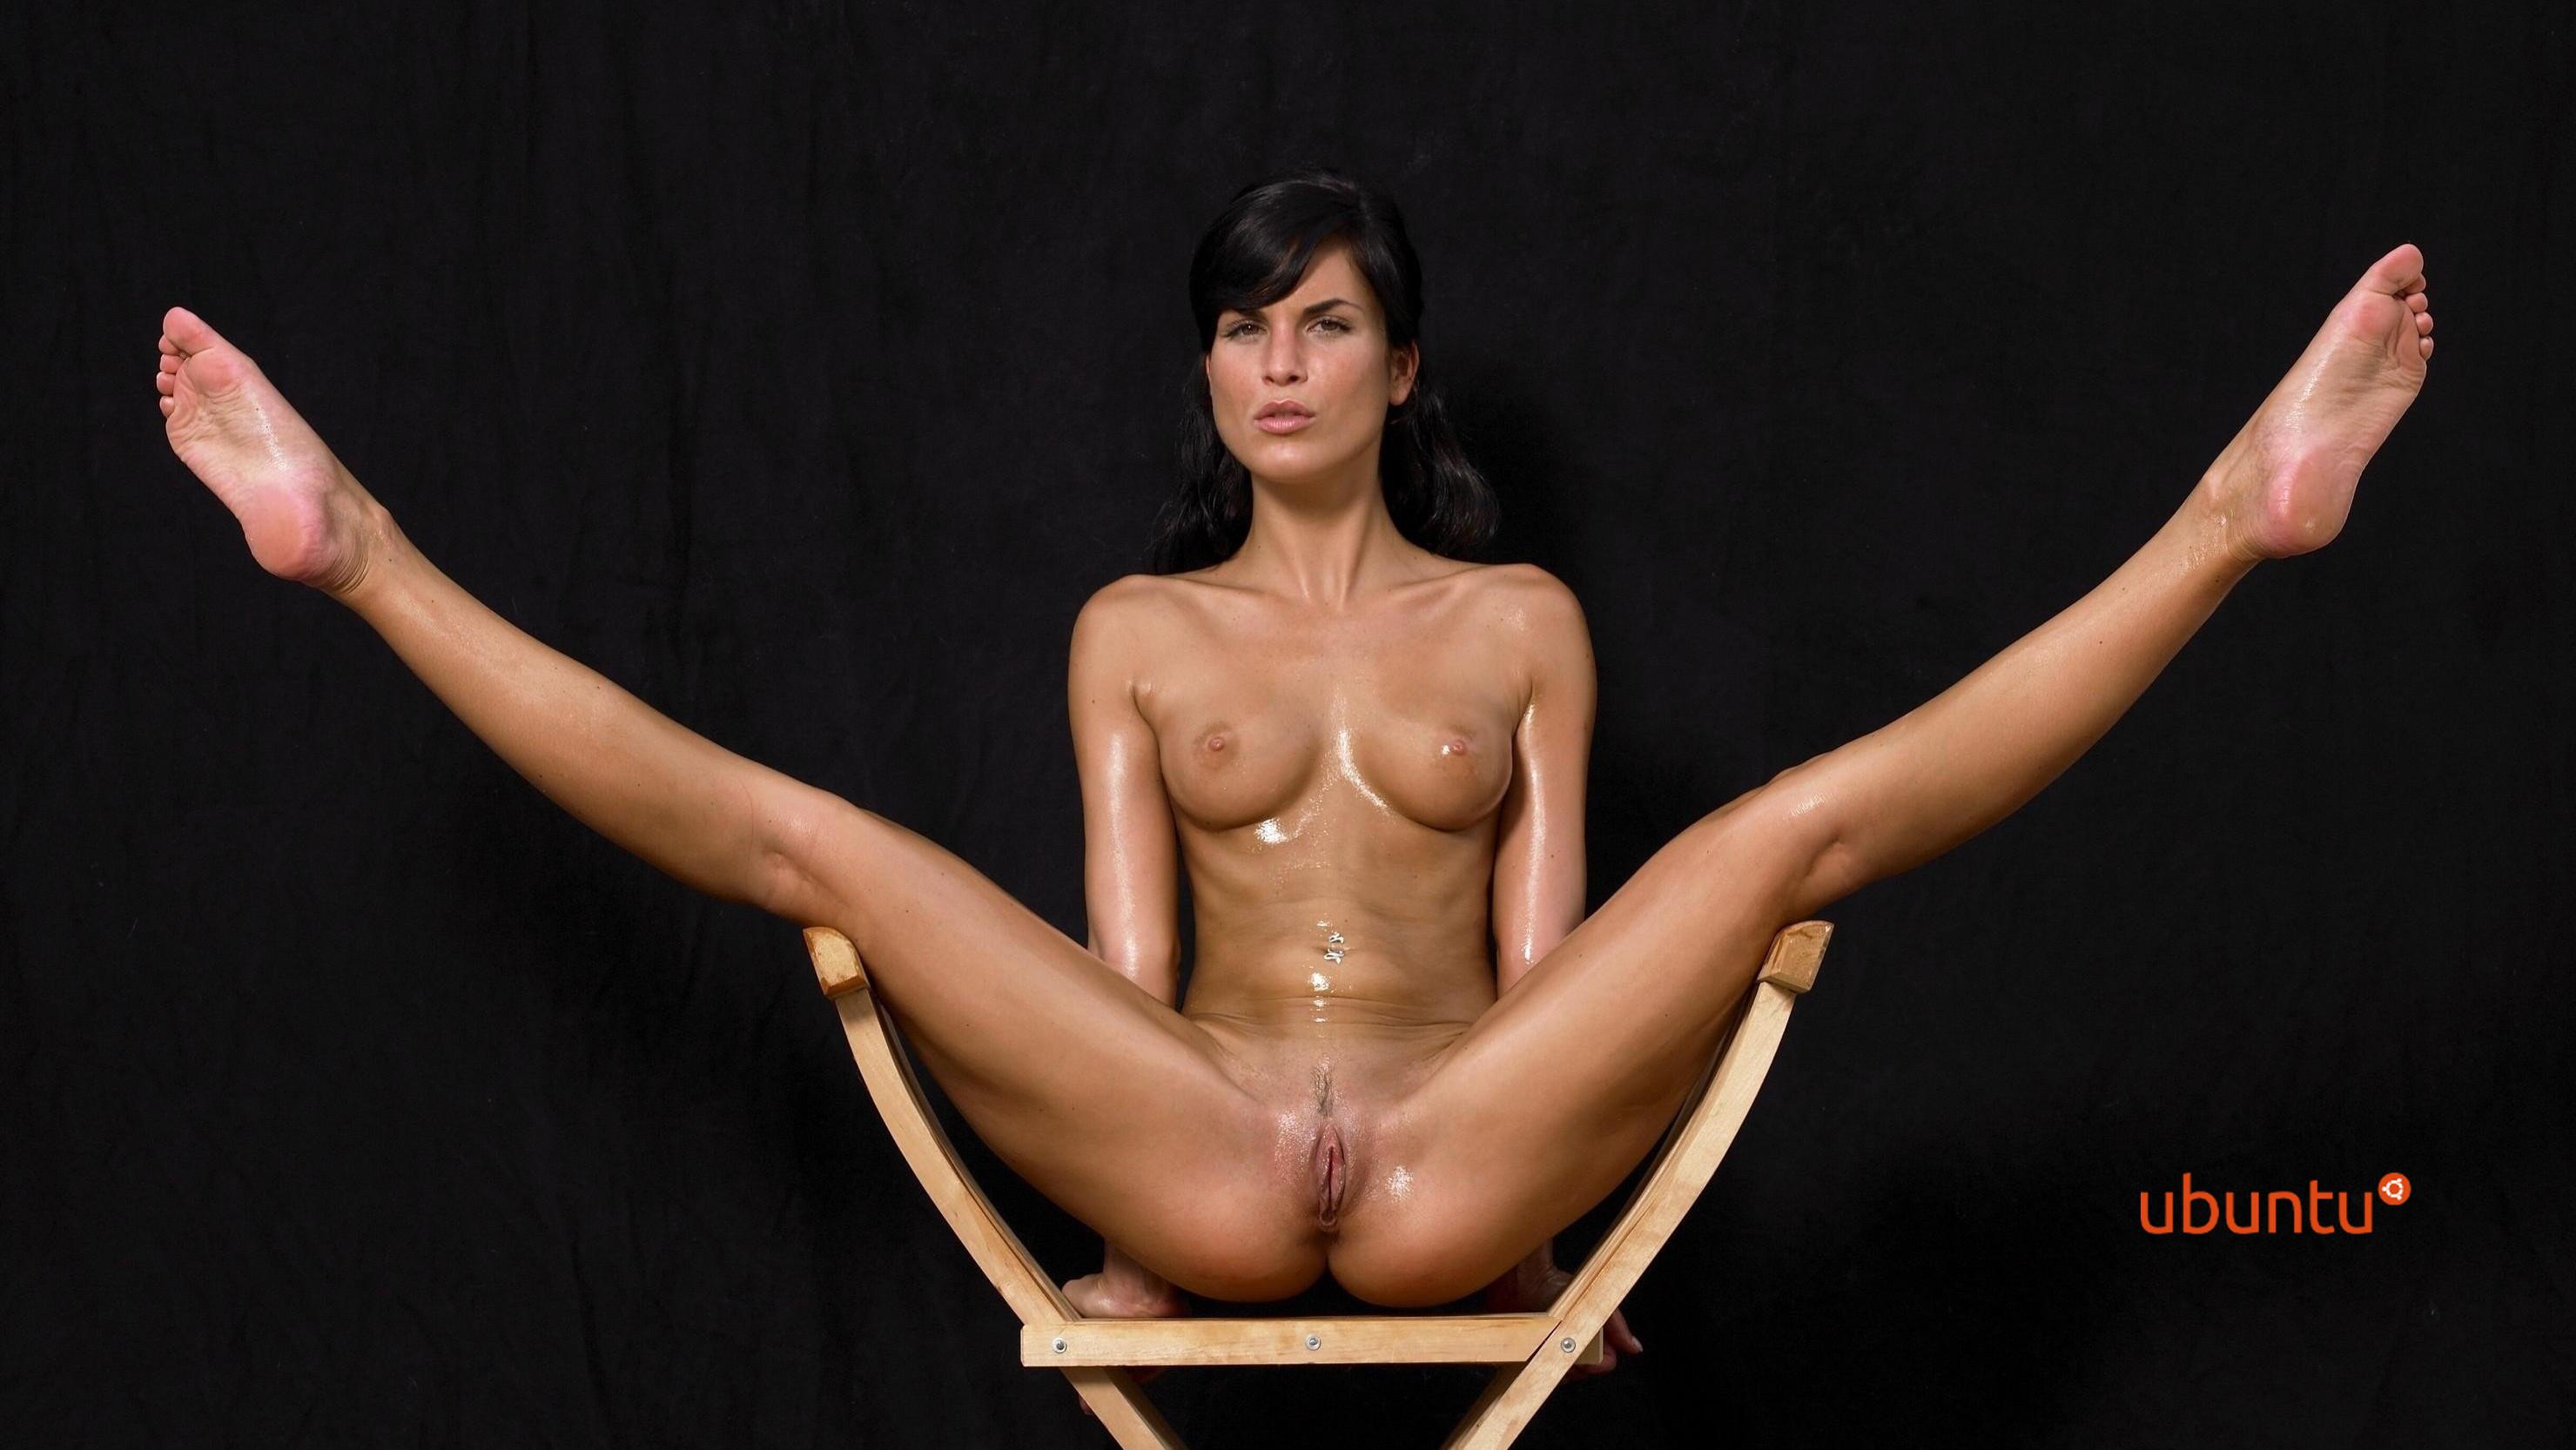 Christy canyon anal free pics